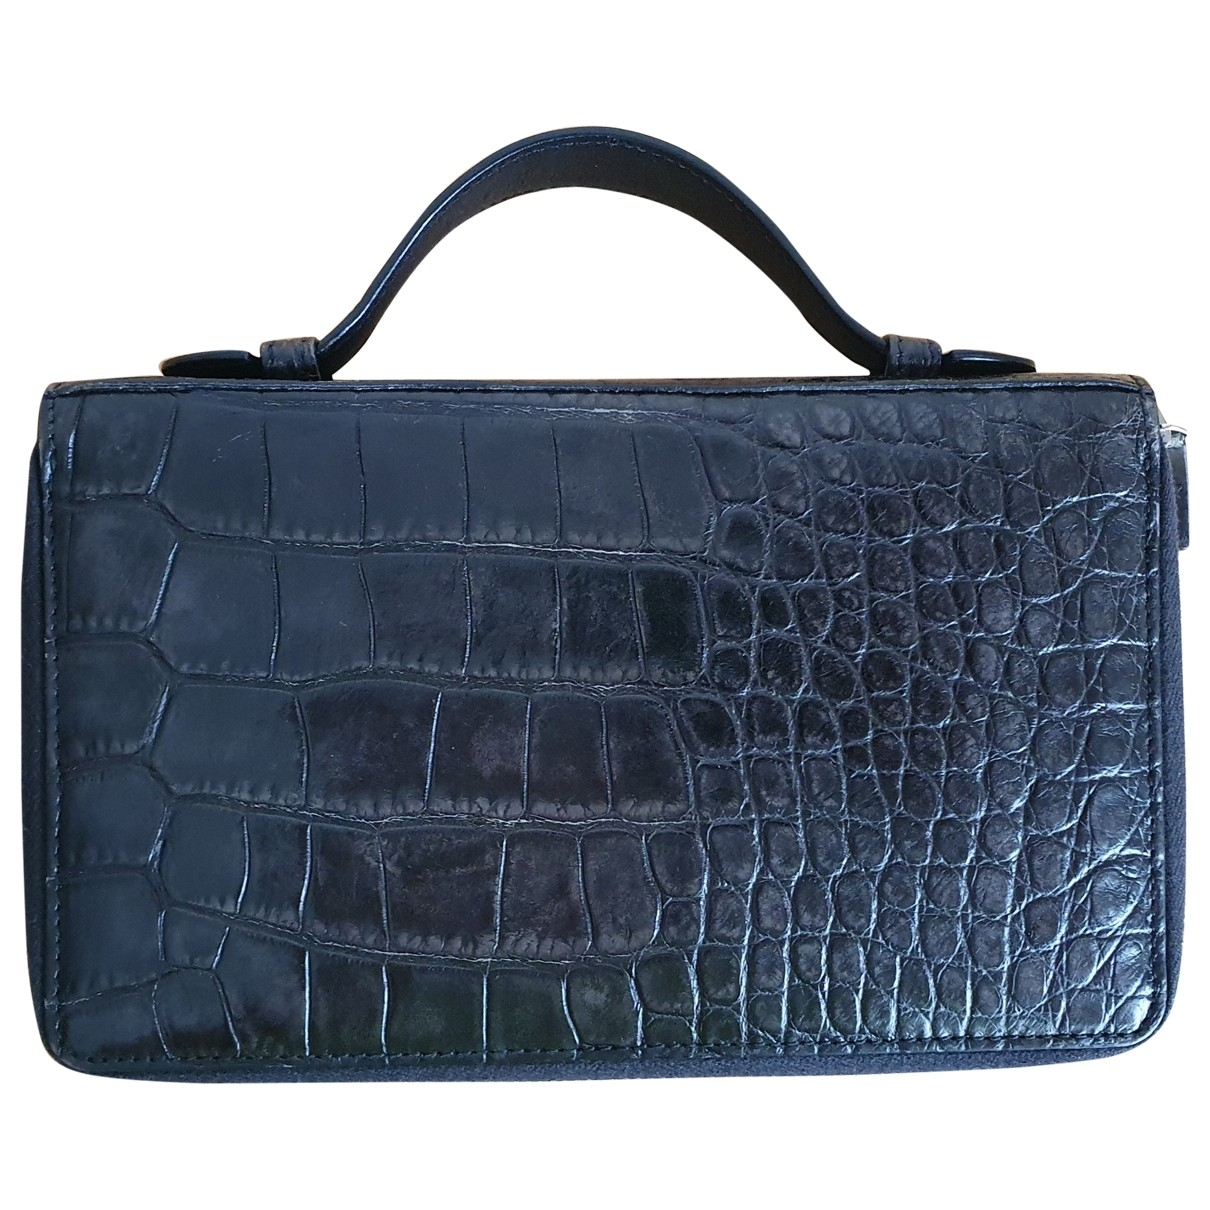 Gucci \N Black Crocodile Small bag, wallet & cases for Men \N